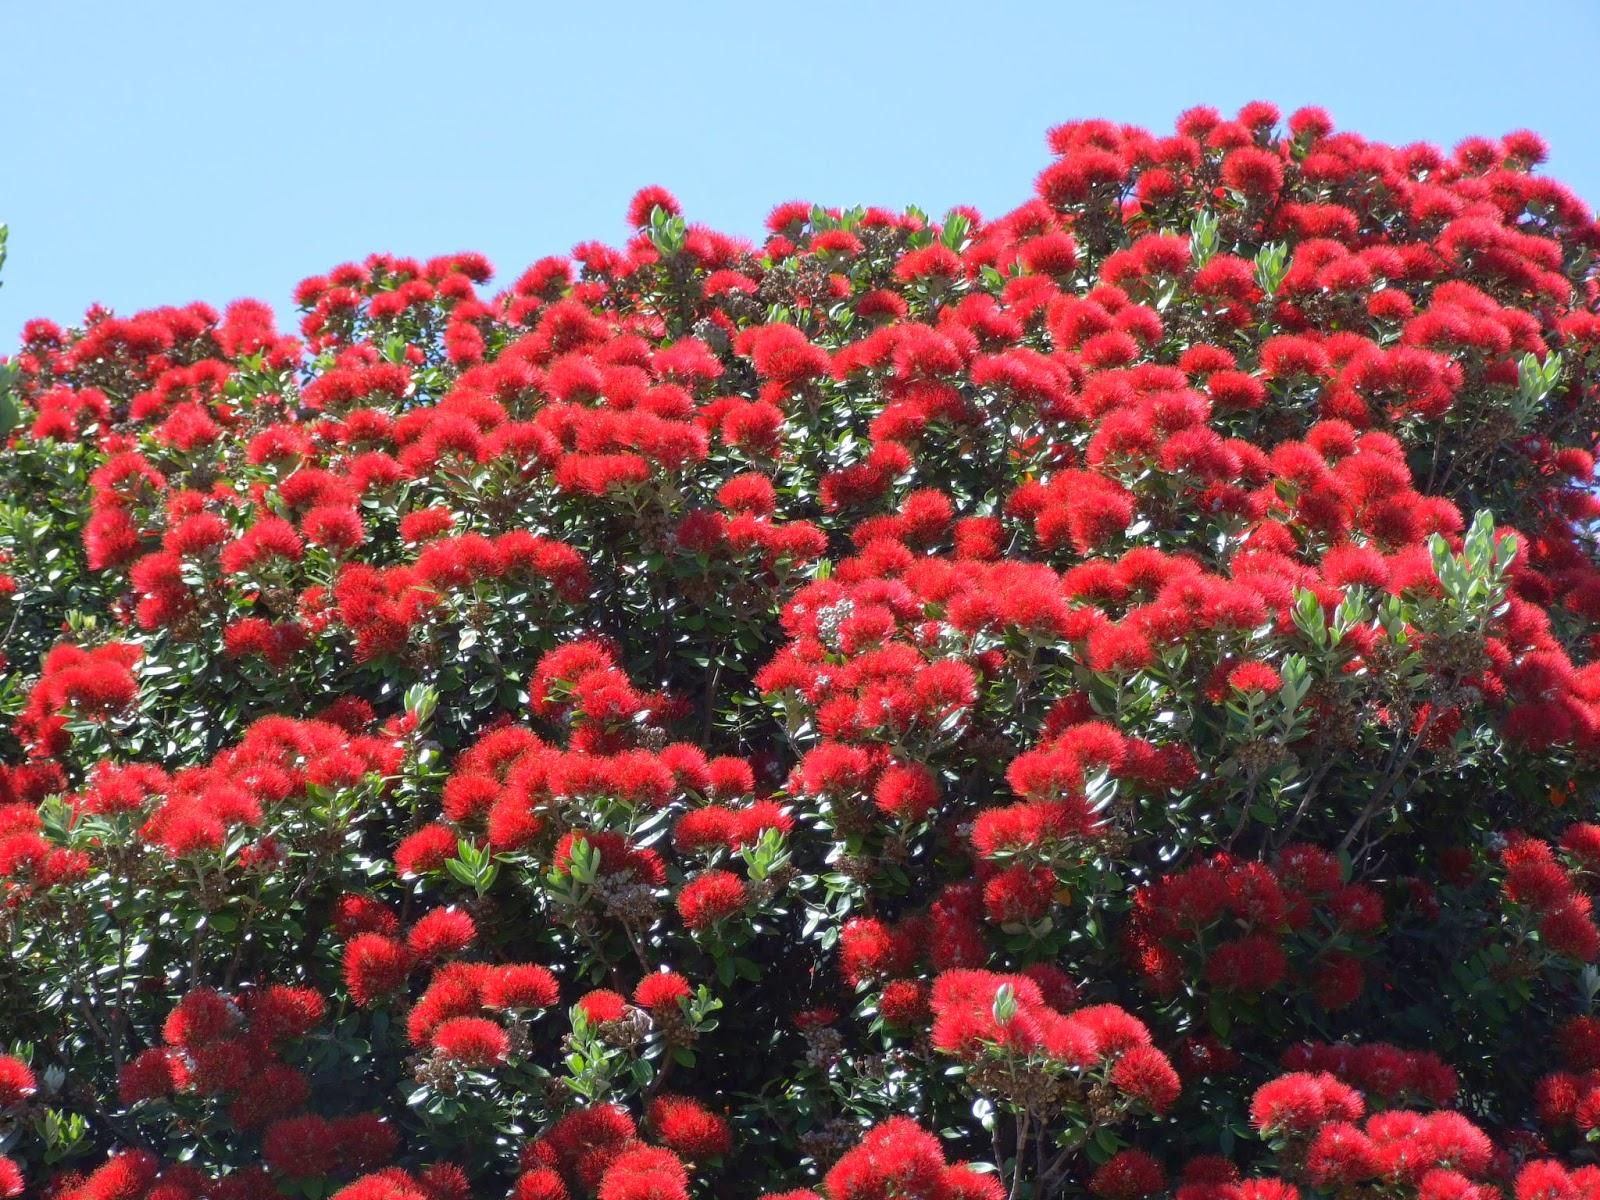 THE NEW ZEALAND CHRISTMAS TREE